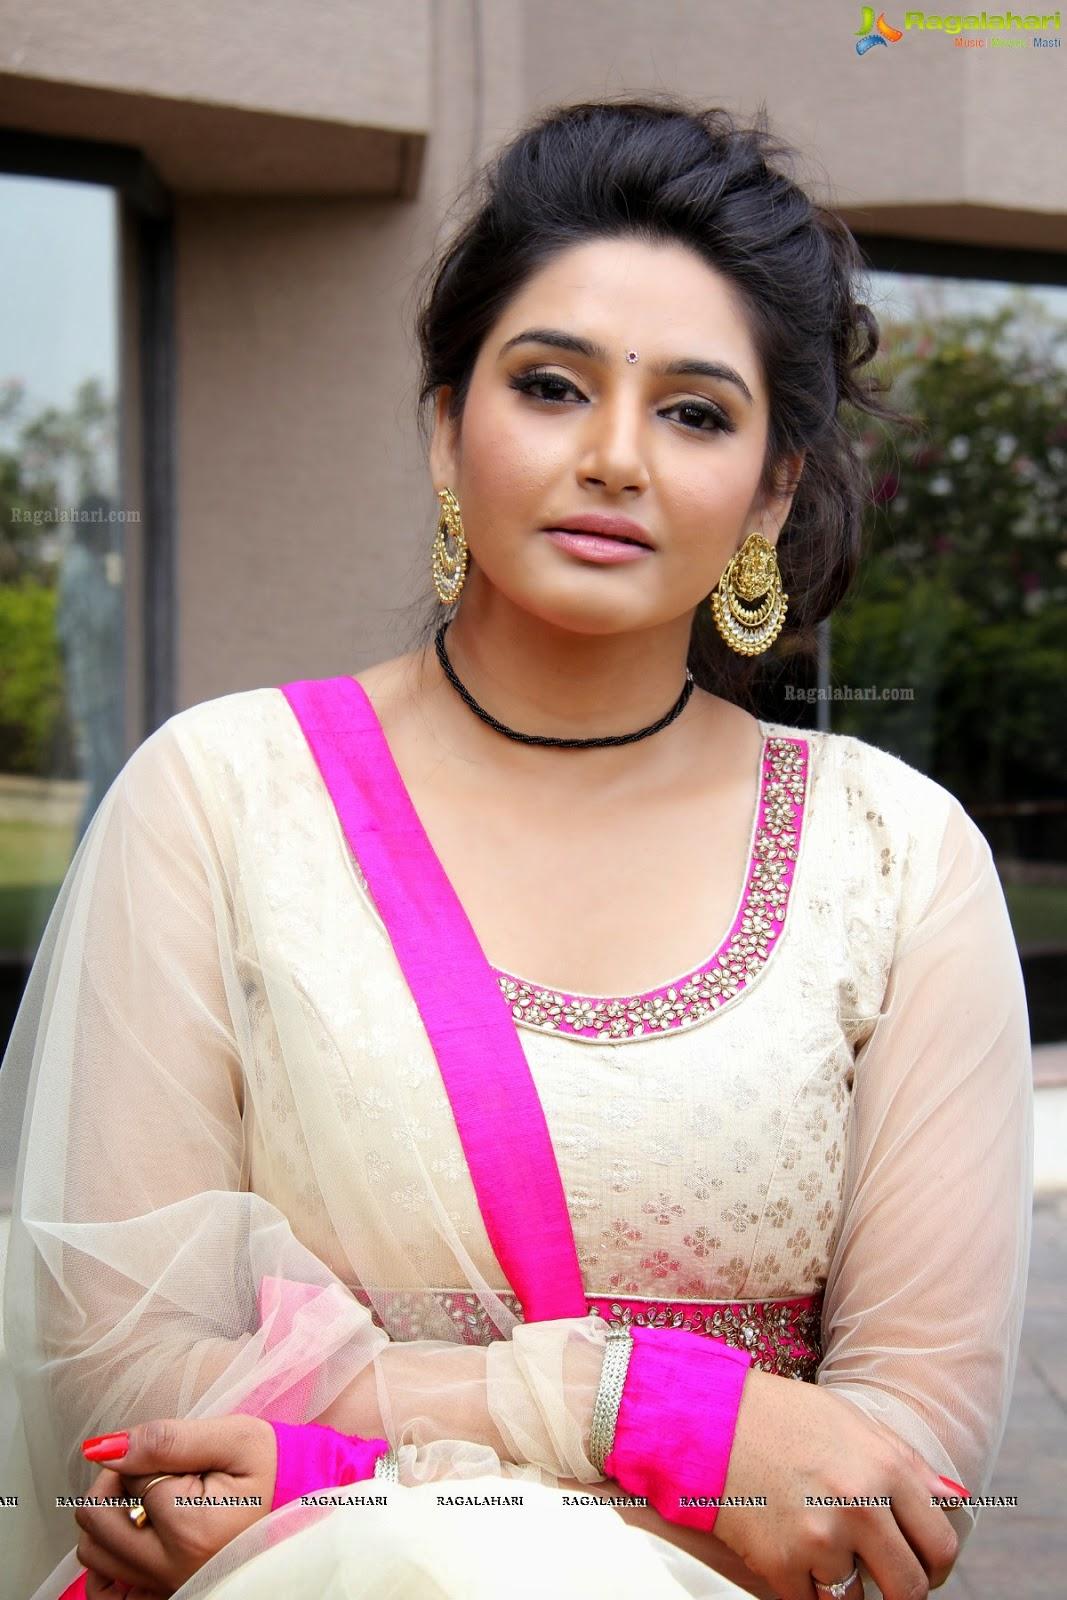 Ragini Dwivedi Latest Images In Punjabi Dress-6758